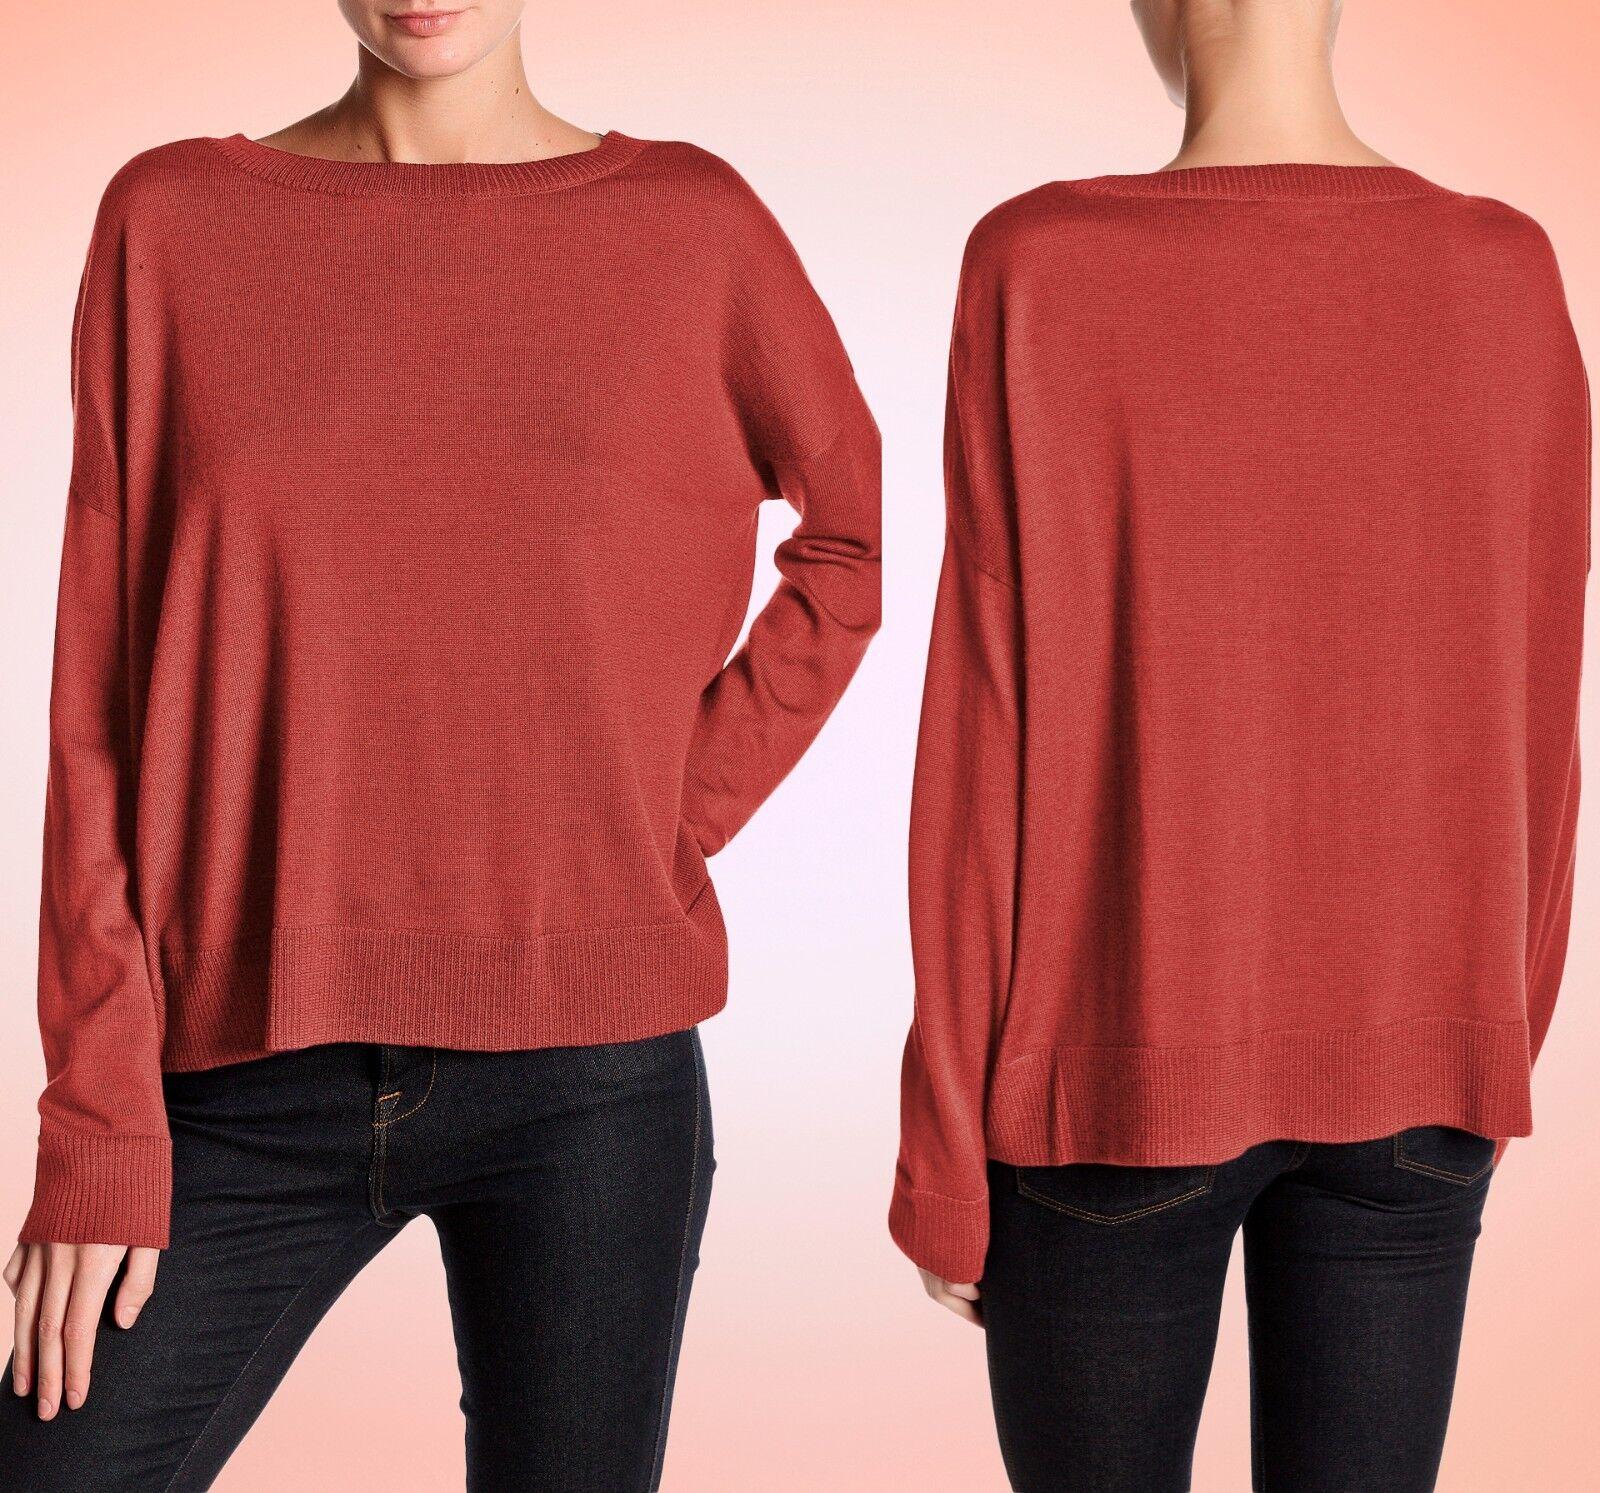 178 Eileen Fisher Merino Jersey Red Saffron Bateau Boxy Sweater Top L